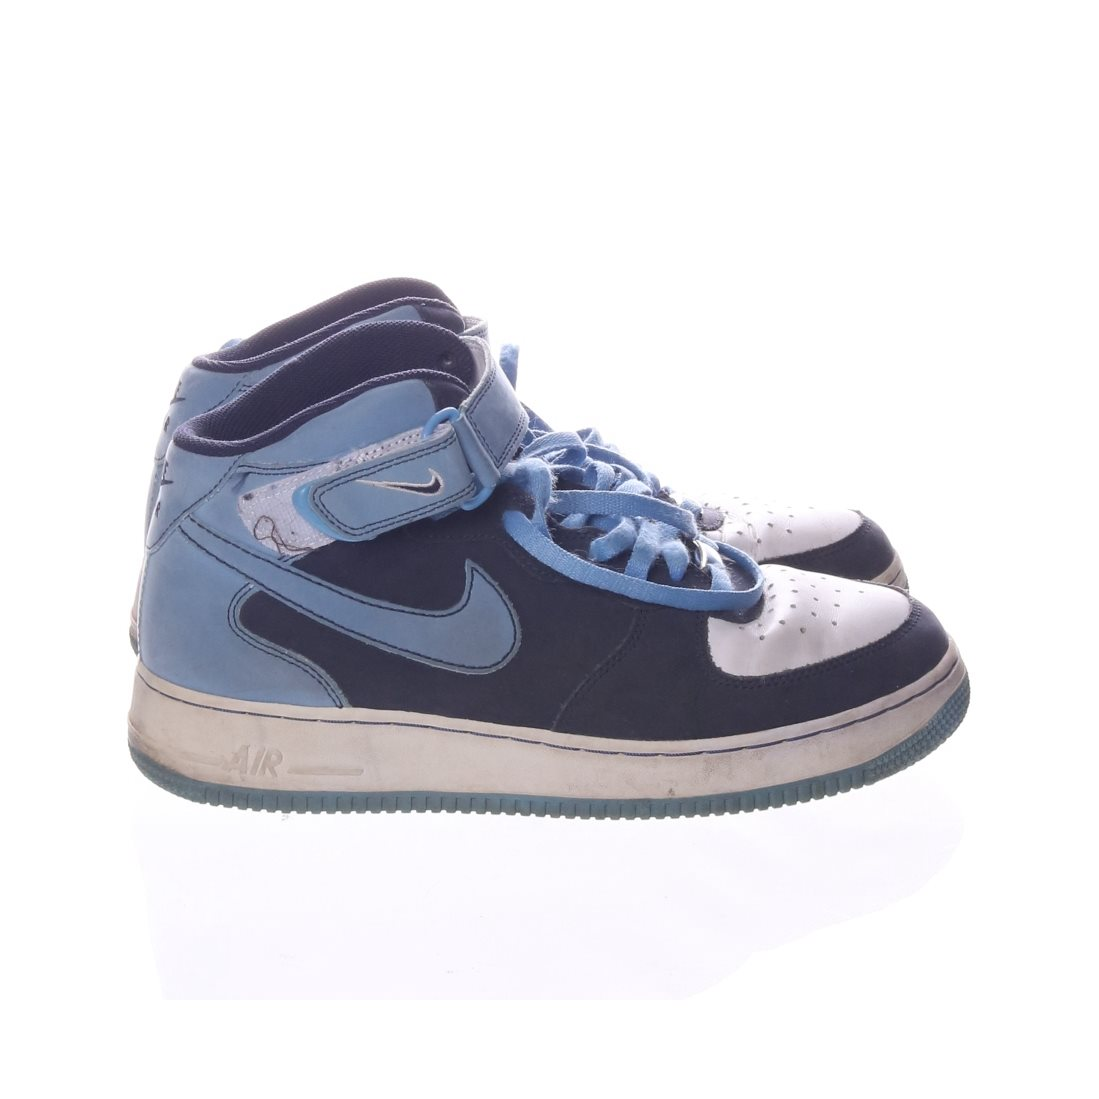 size 40 35441 cd665 Nike Air Force, Sneakers, Strl  42,5, Blå Vit